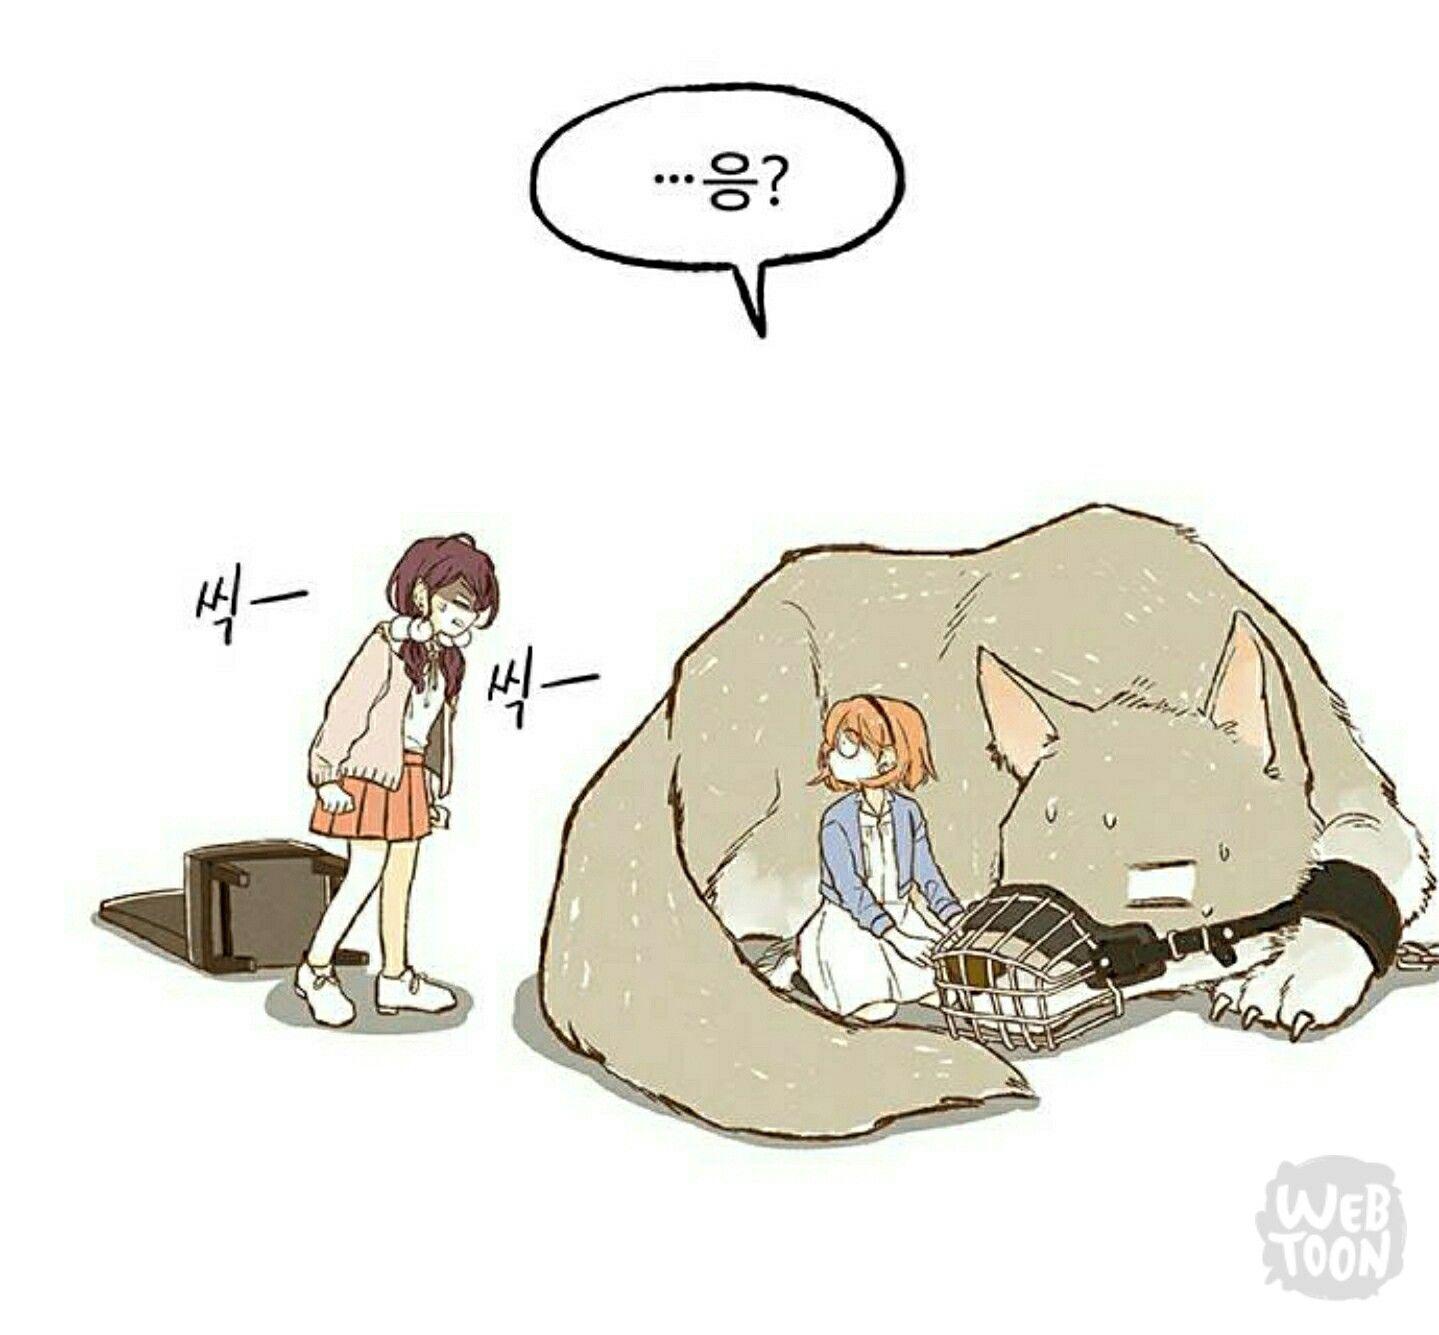 Naver webtoon, 슈퍼 시크릿, Super secret webtoon Pinterest